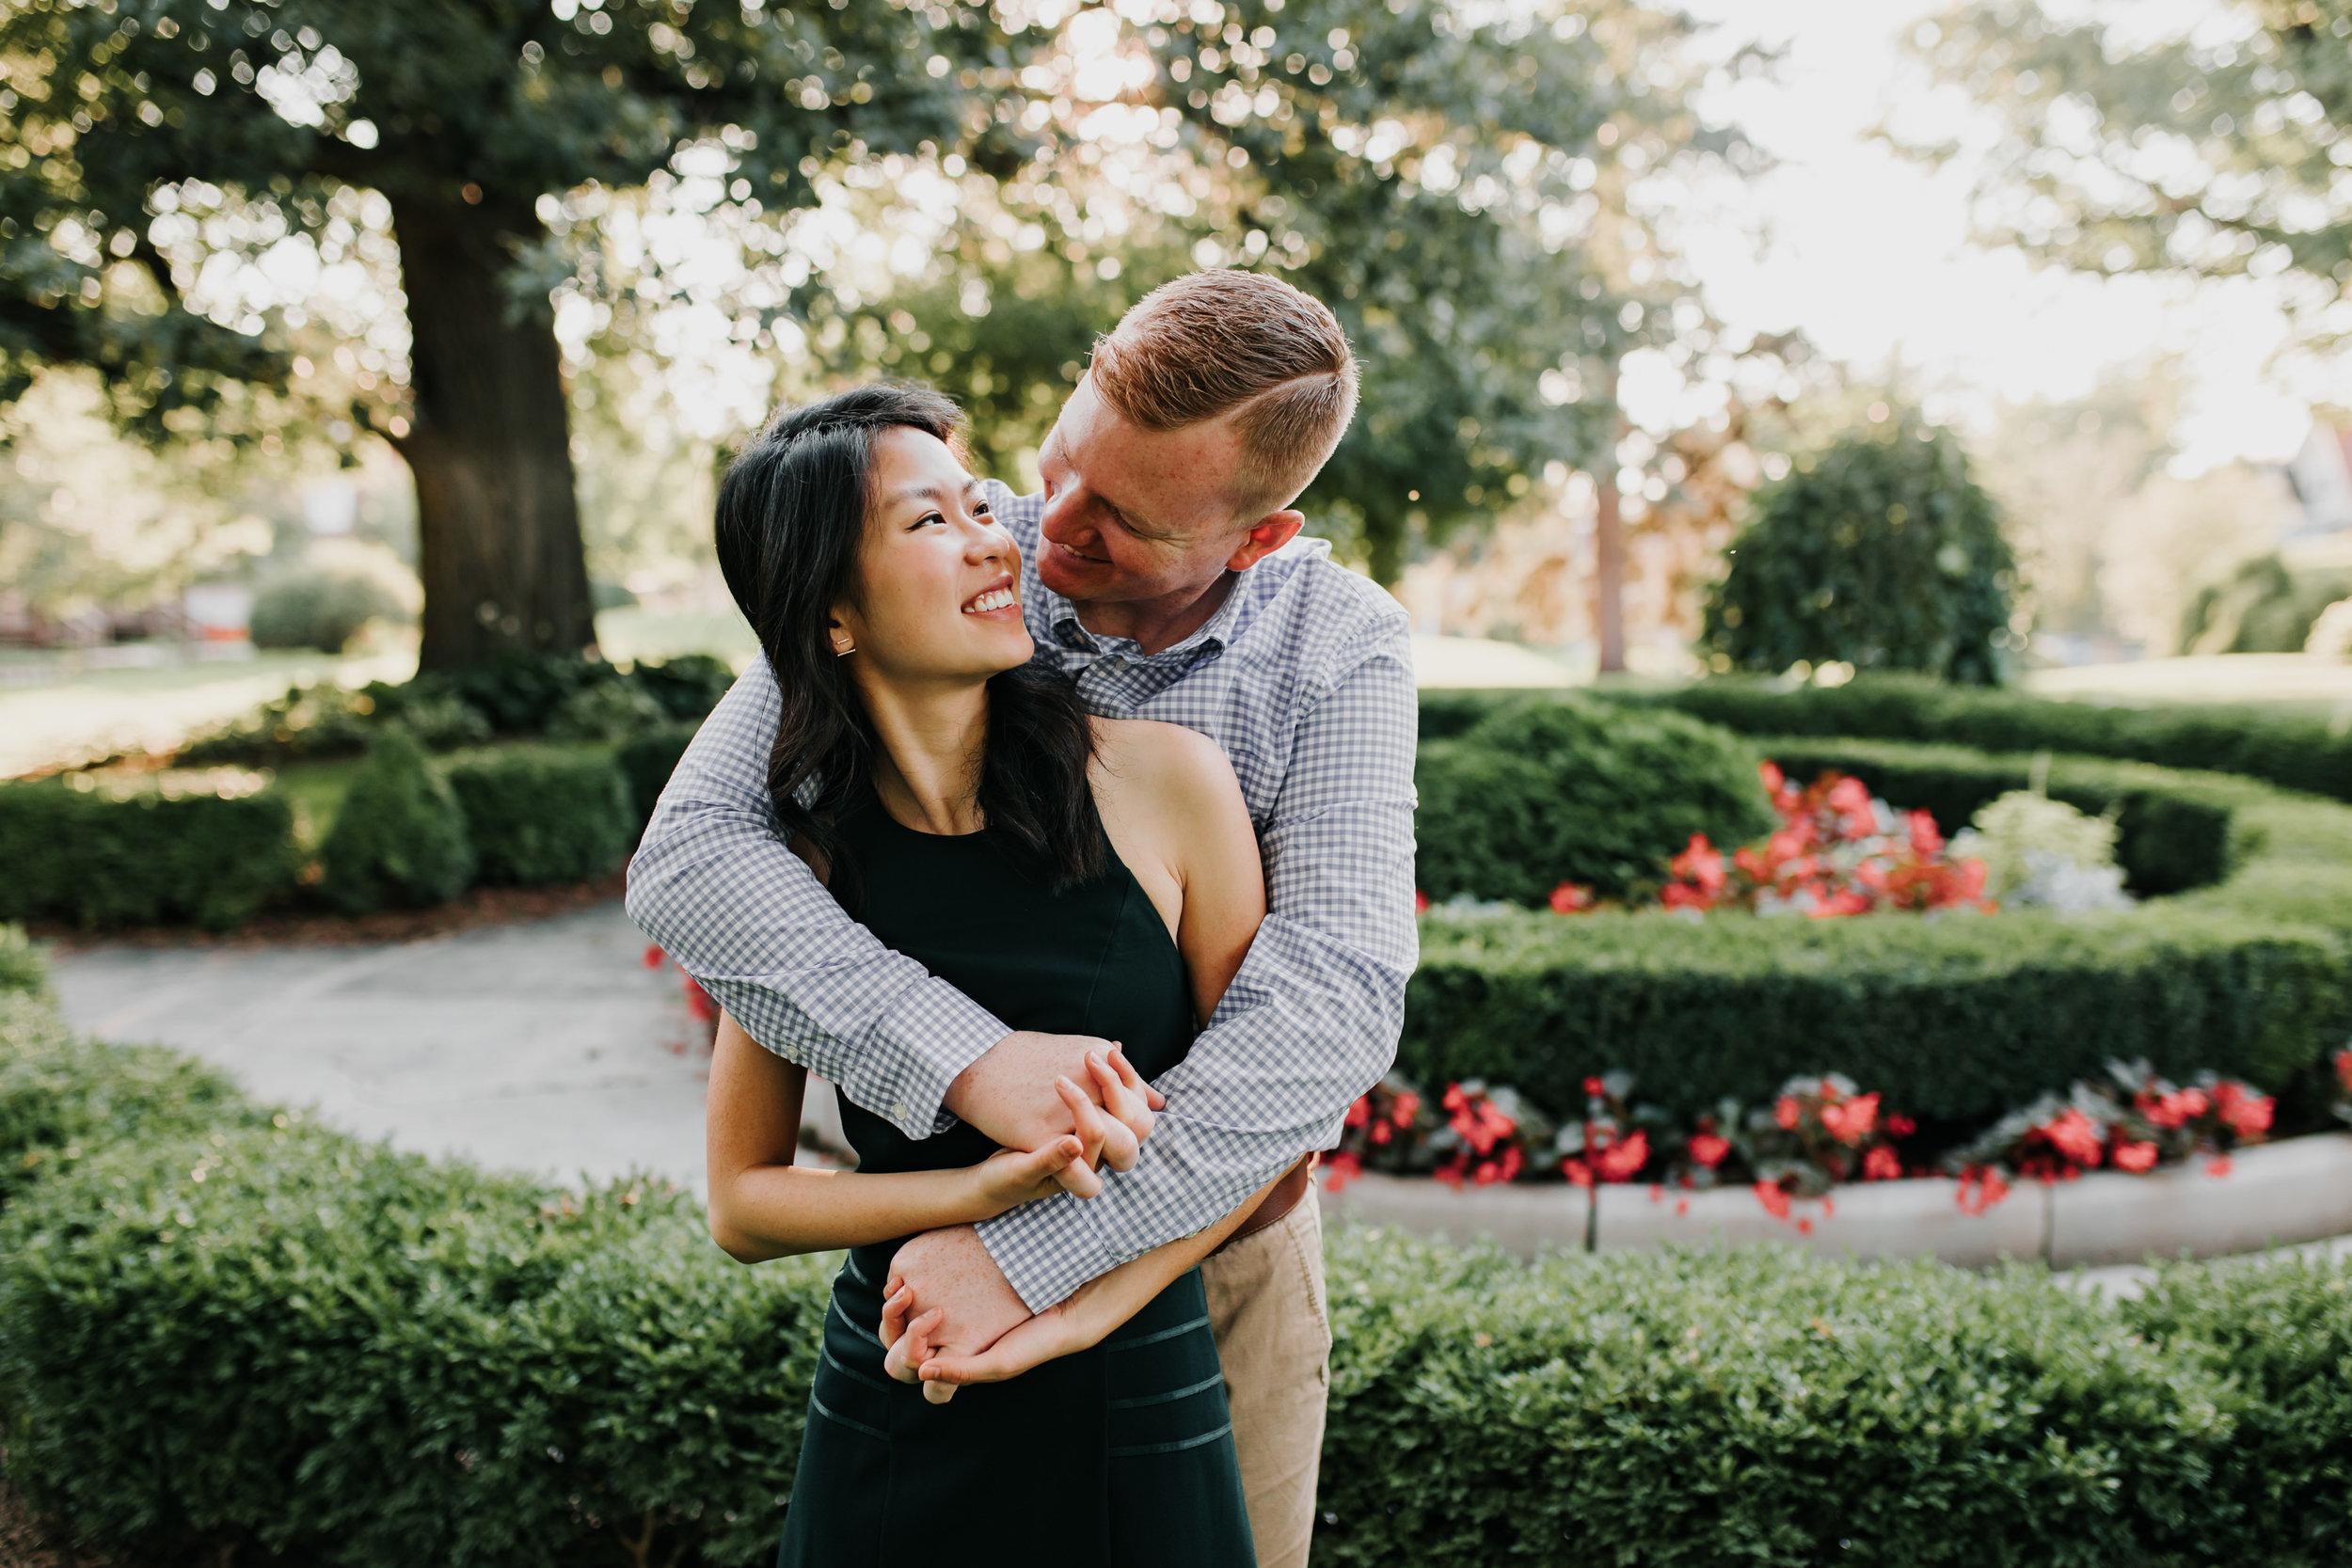 Catherin & Kyle - Married - Nathaniel Jensen Photography - Omaha Nebraska Wedding Photograper - Memorial Park - Joslyn Castle Engagement Session-42.jpg